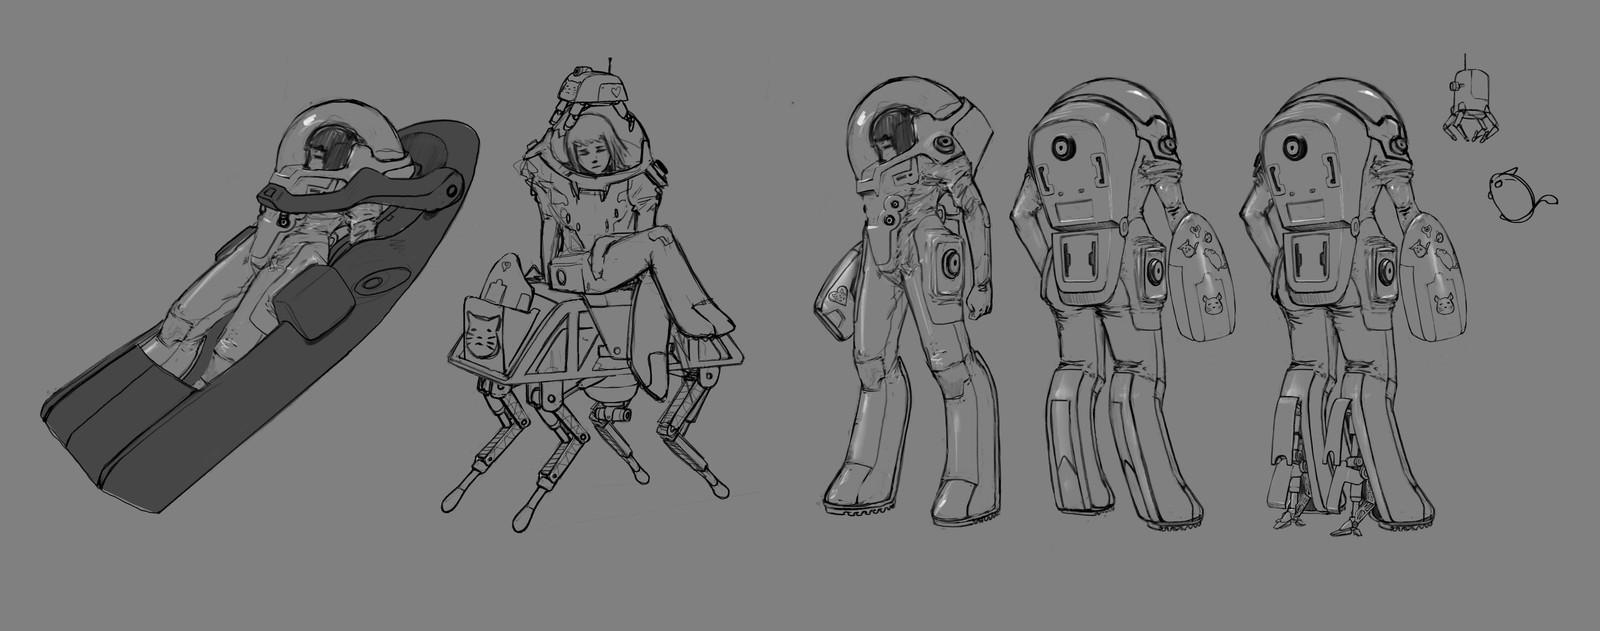 Astronaut Betty